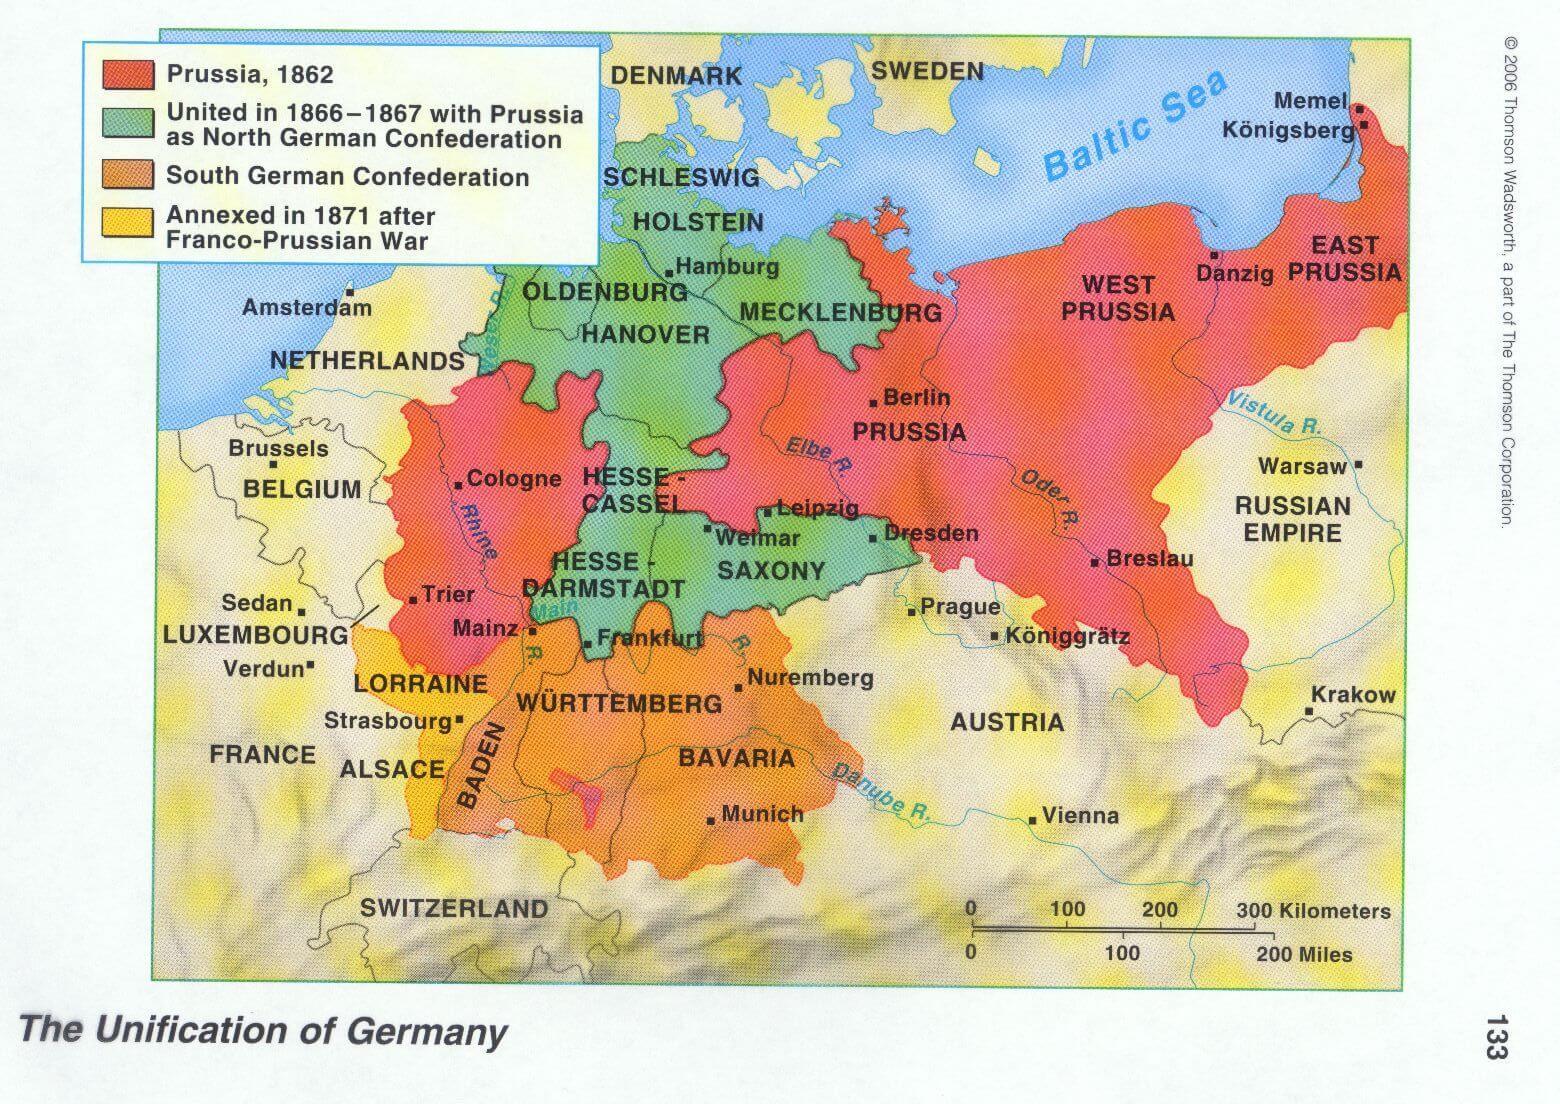 germanyunification